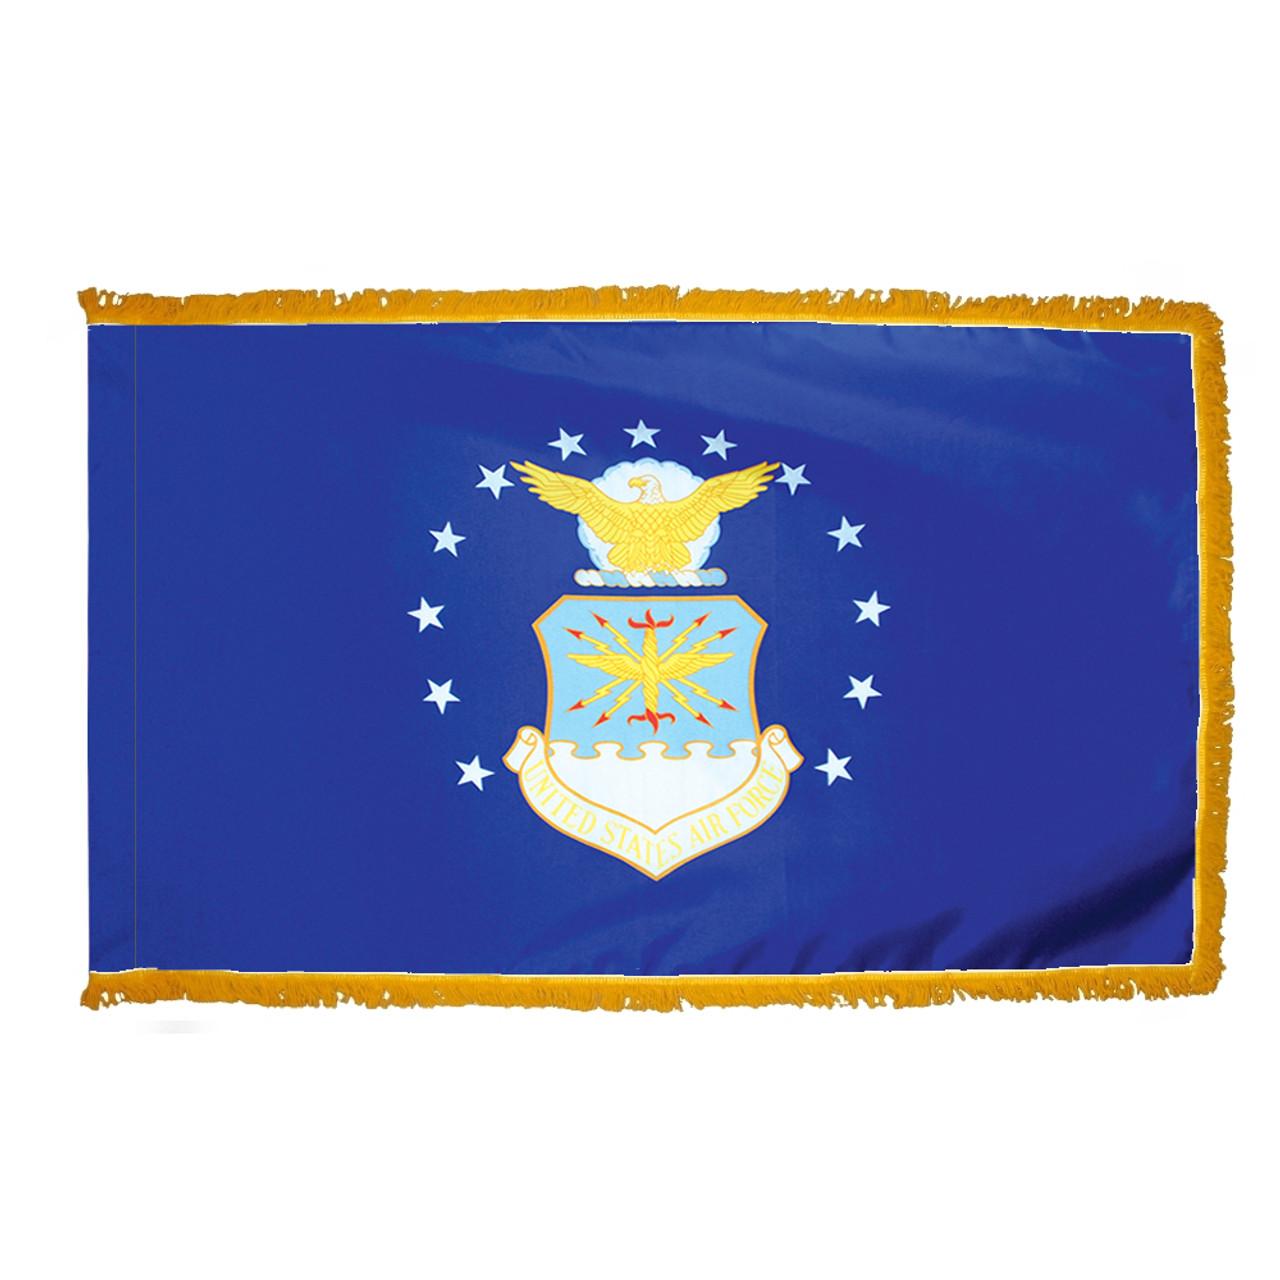 Indoor Display Air Force Flag